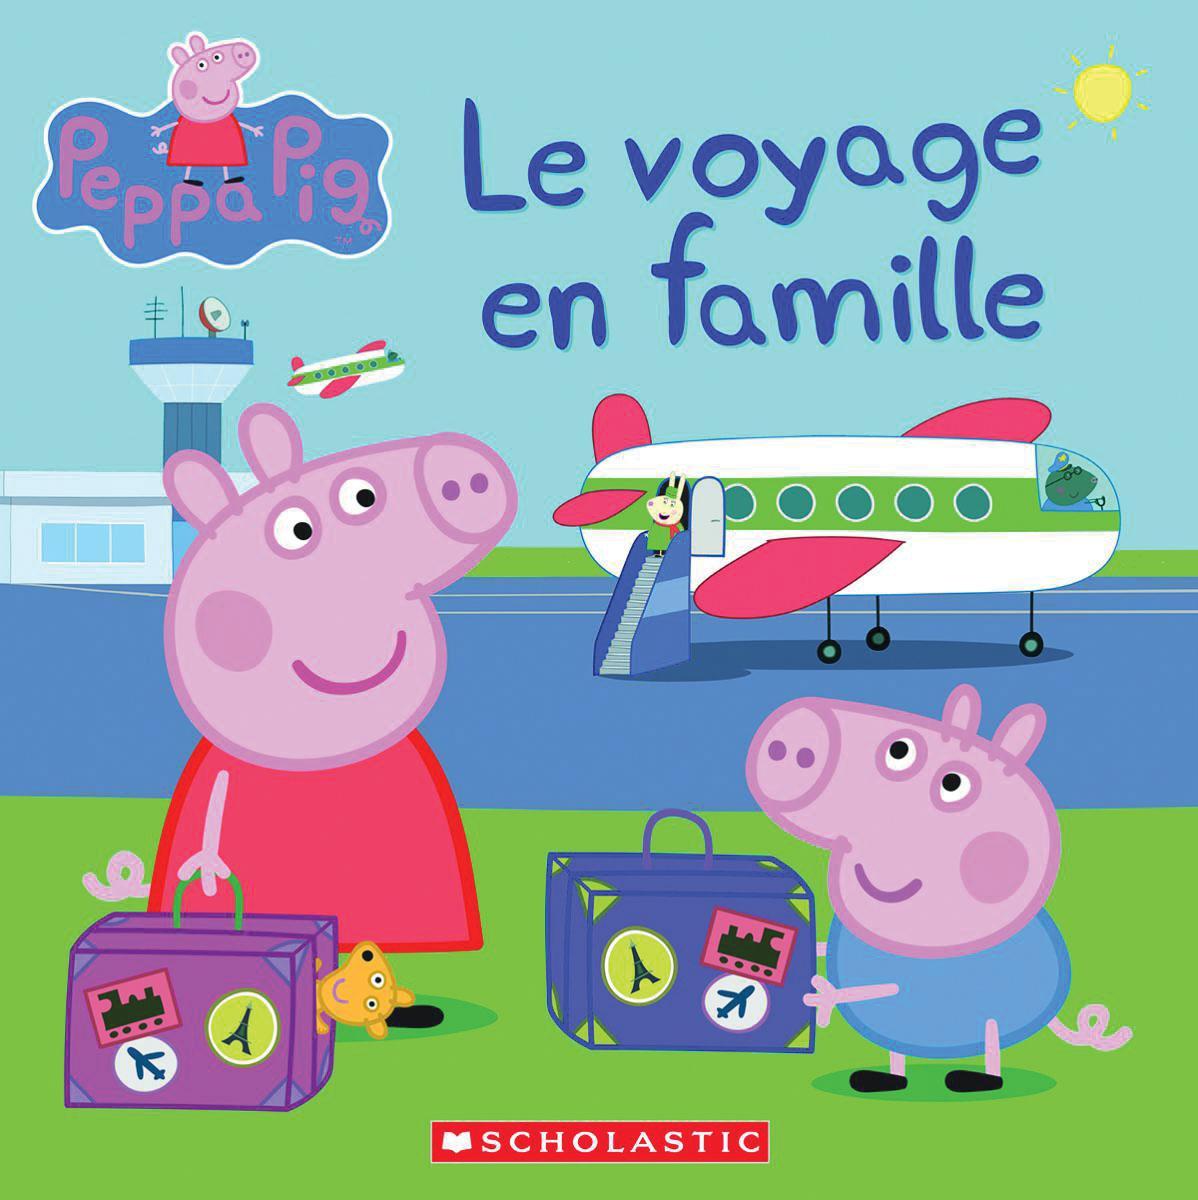 Peppa Pig : Le voyage en famille